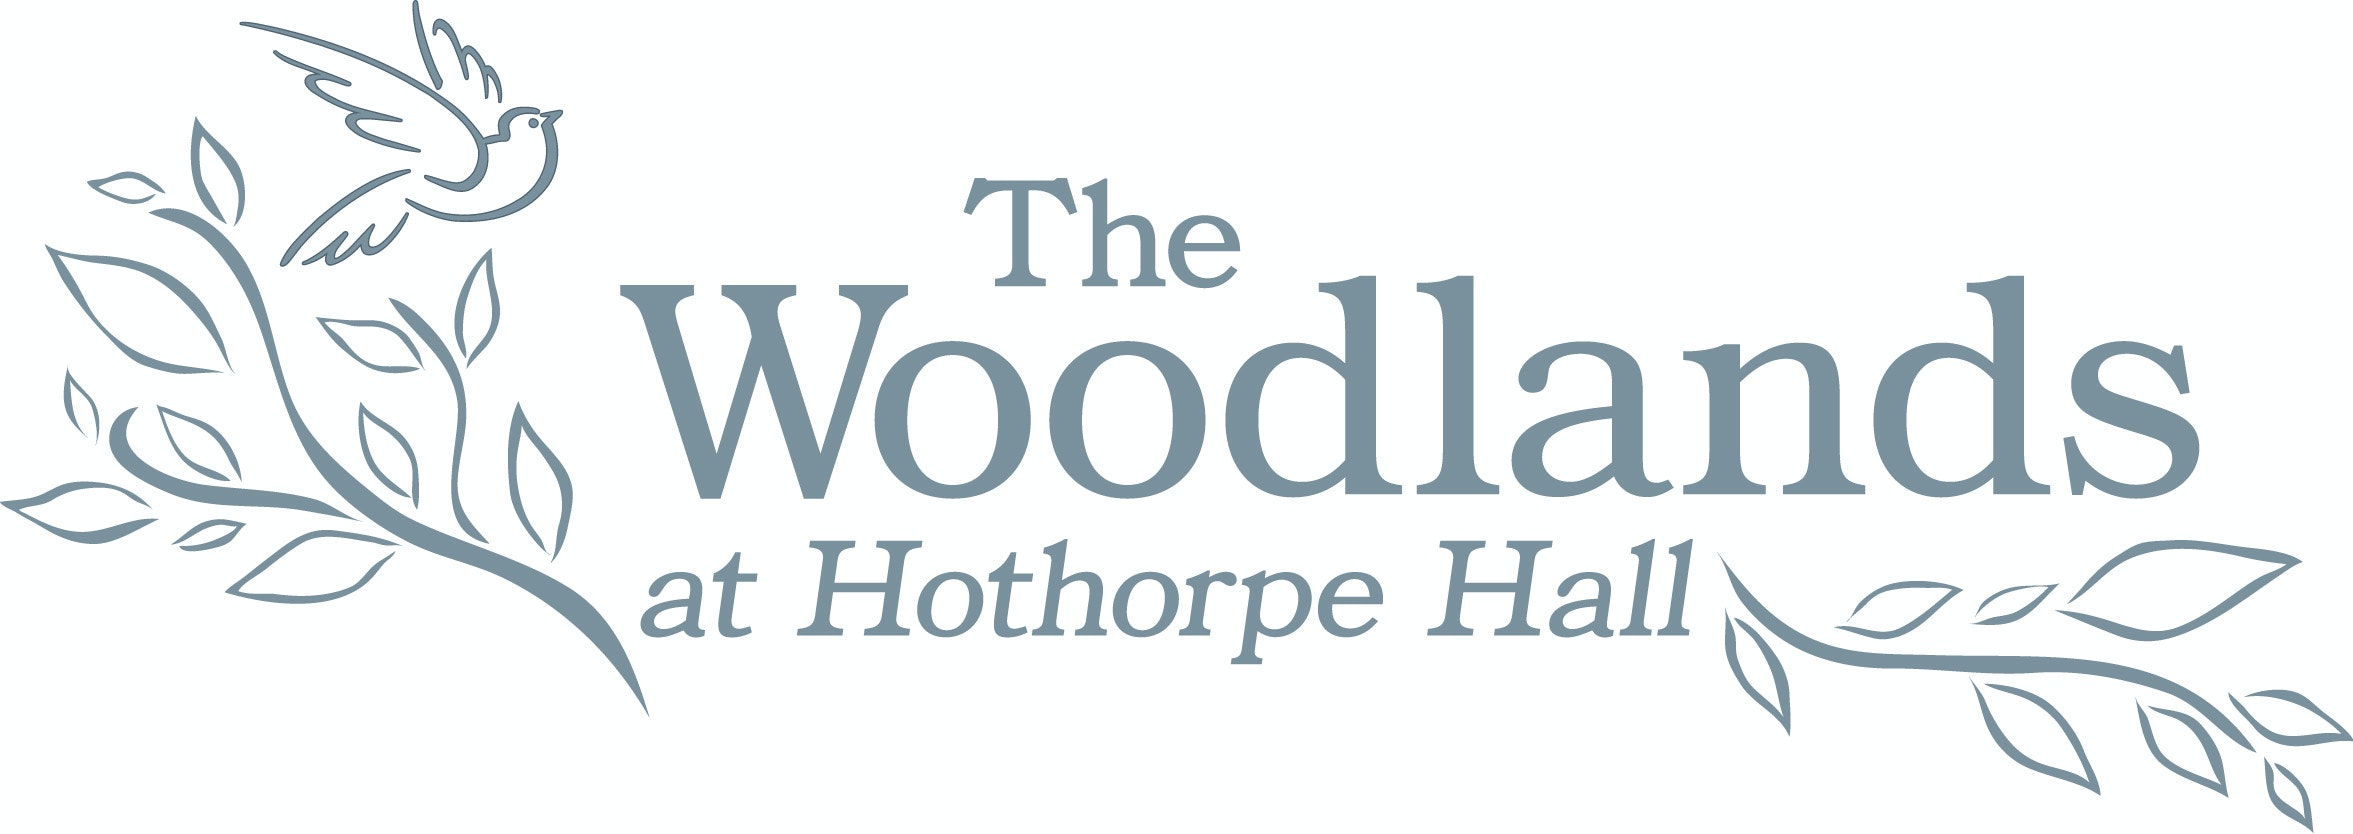 The woodlands at hh logo 1